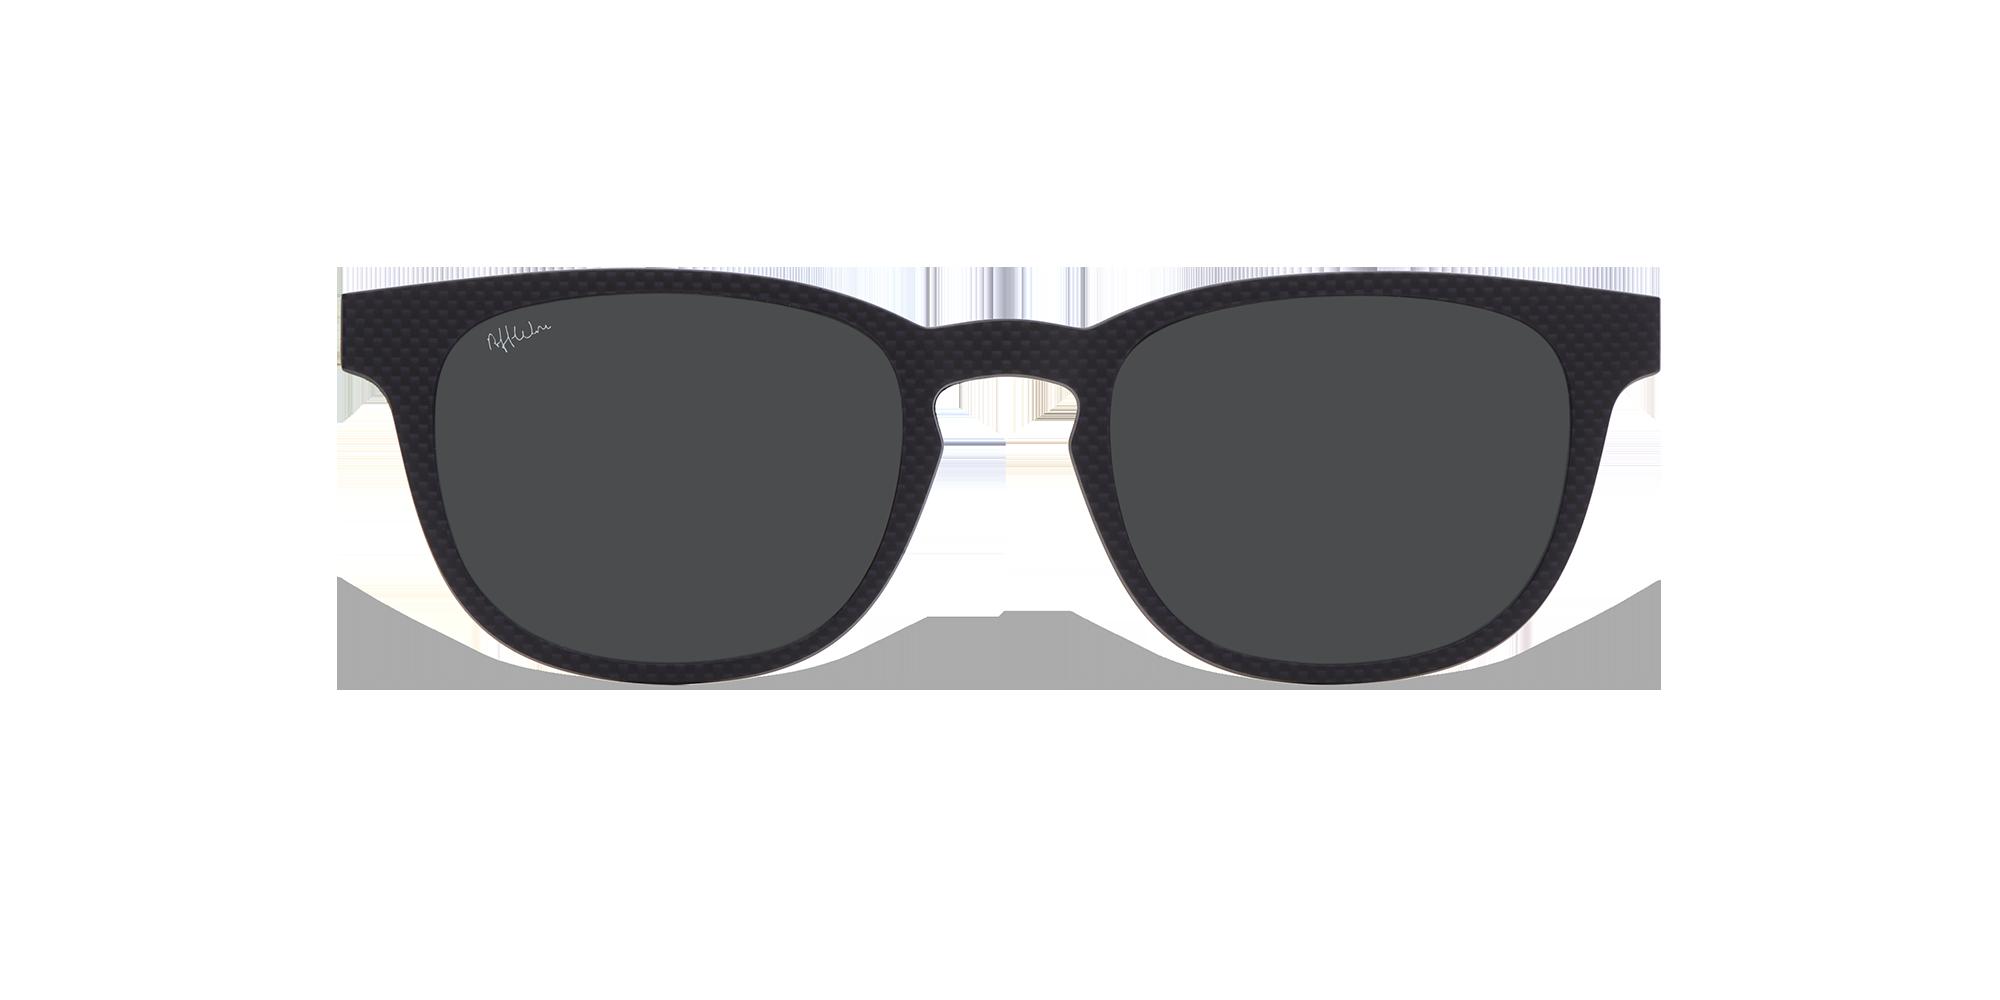 afflelou/france/products/smart_clip/clips_glasses/TMK33S4BK015120.png